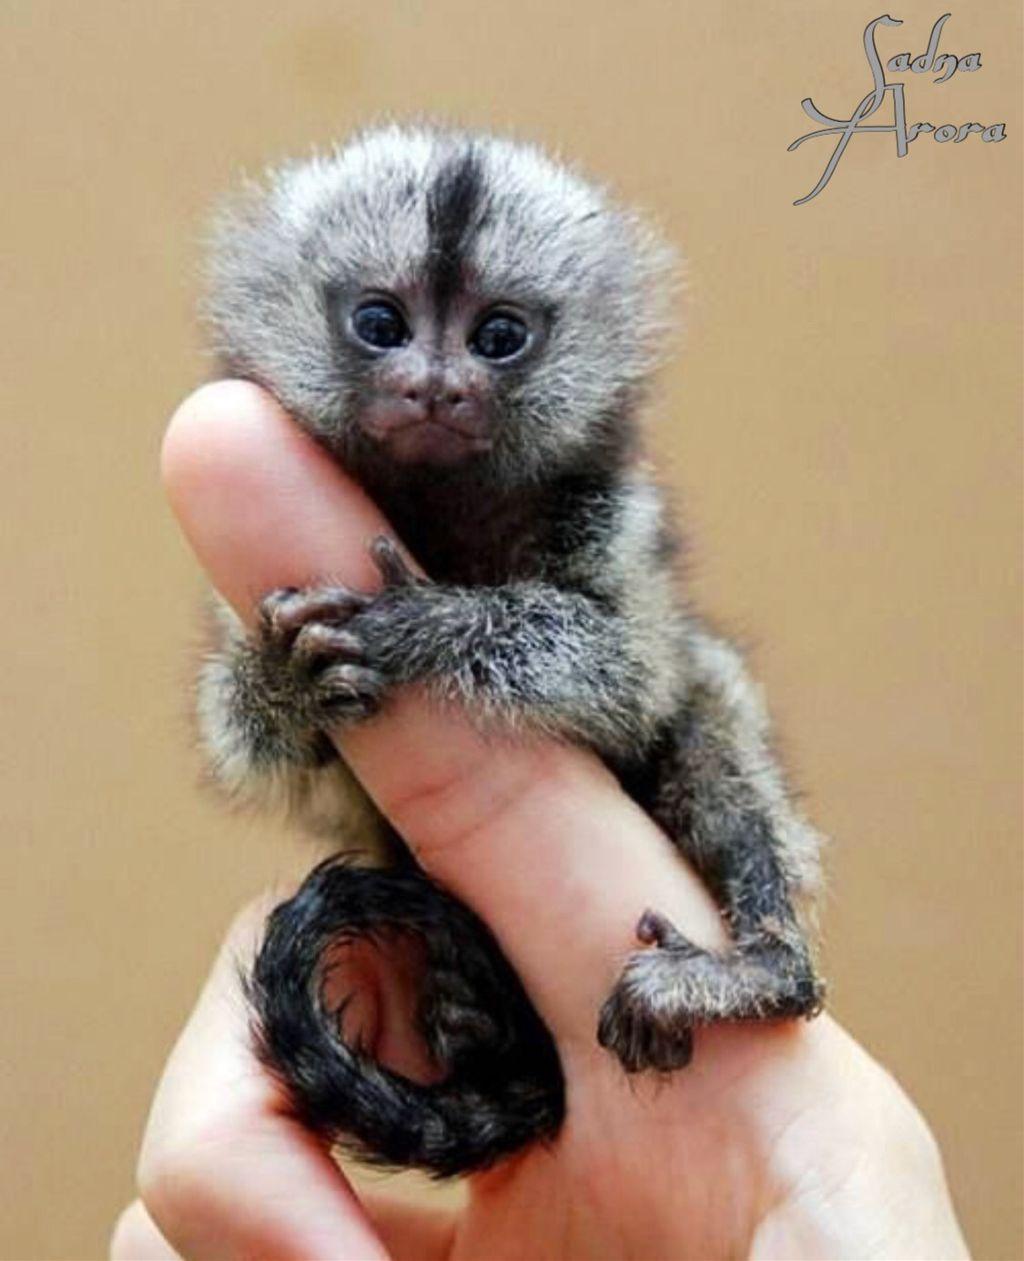 mini #monkey @sadna2018 #animals